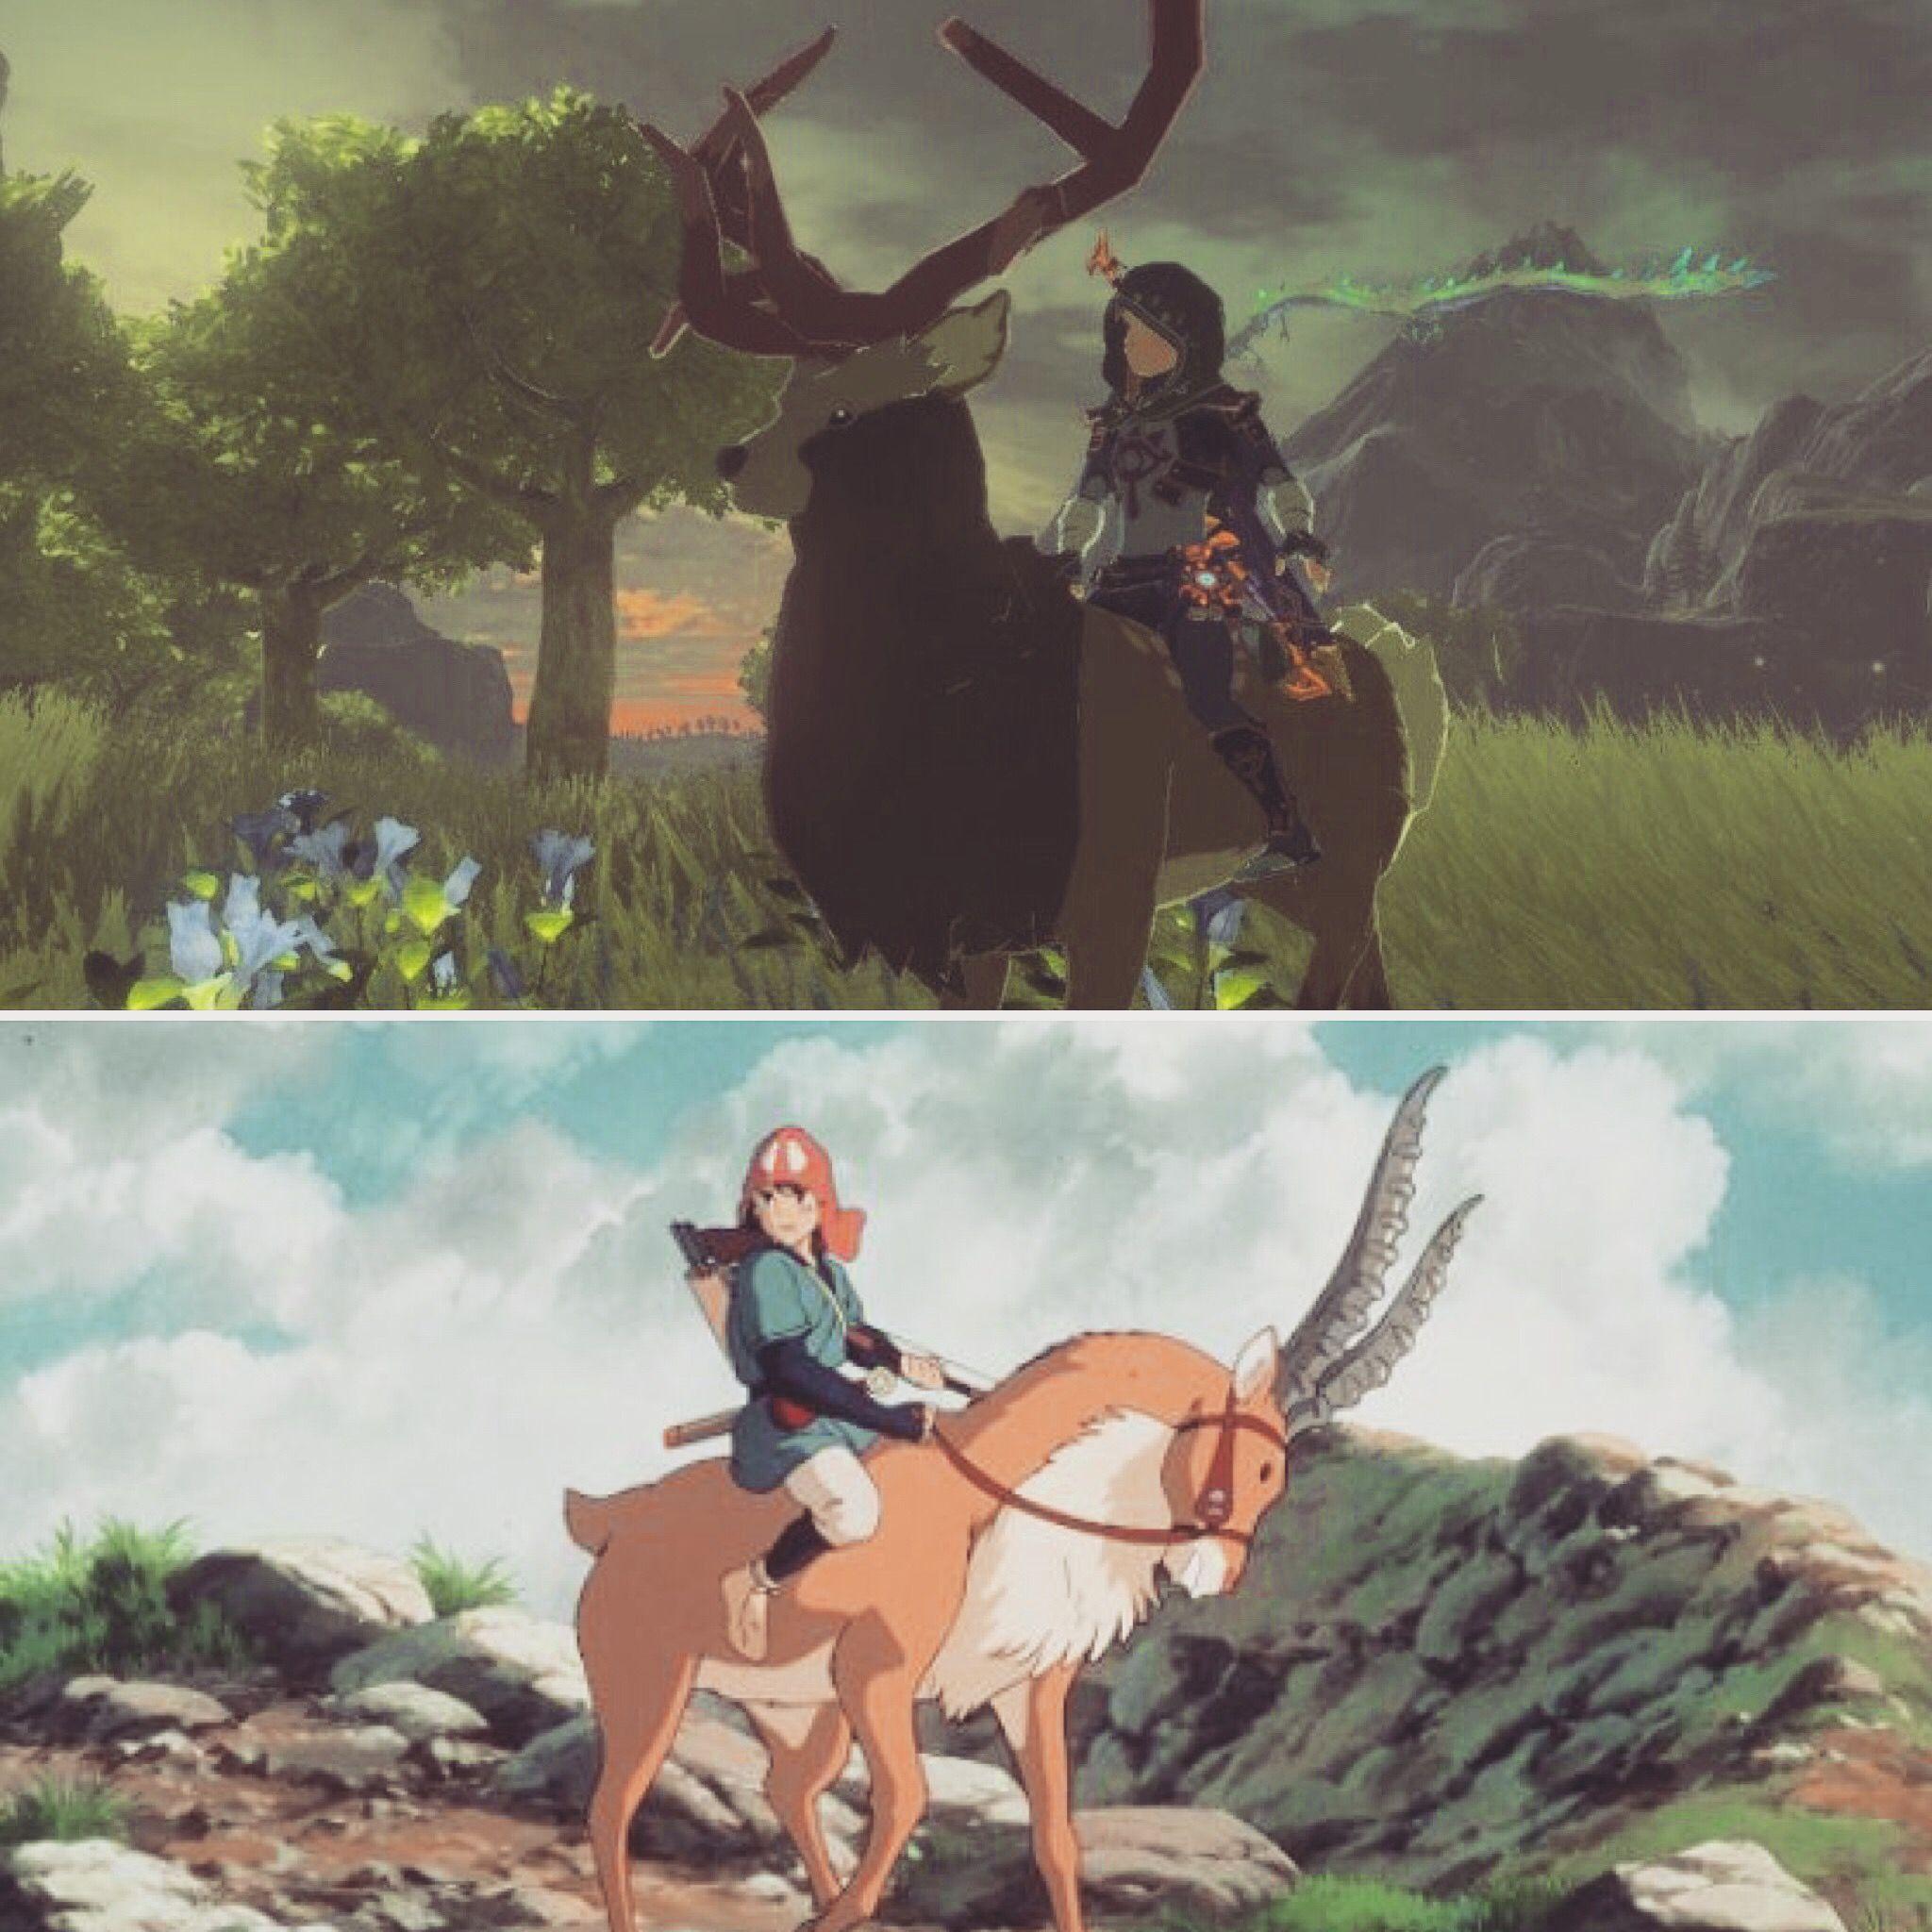 Link from Legend of Zelda: Breath of the Wild looking like ...